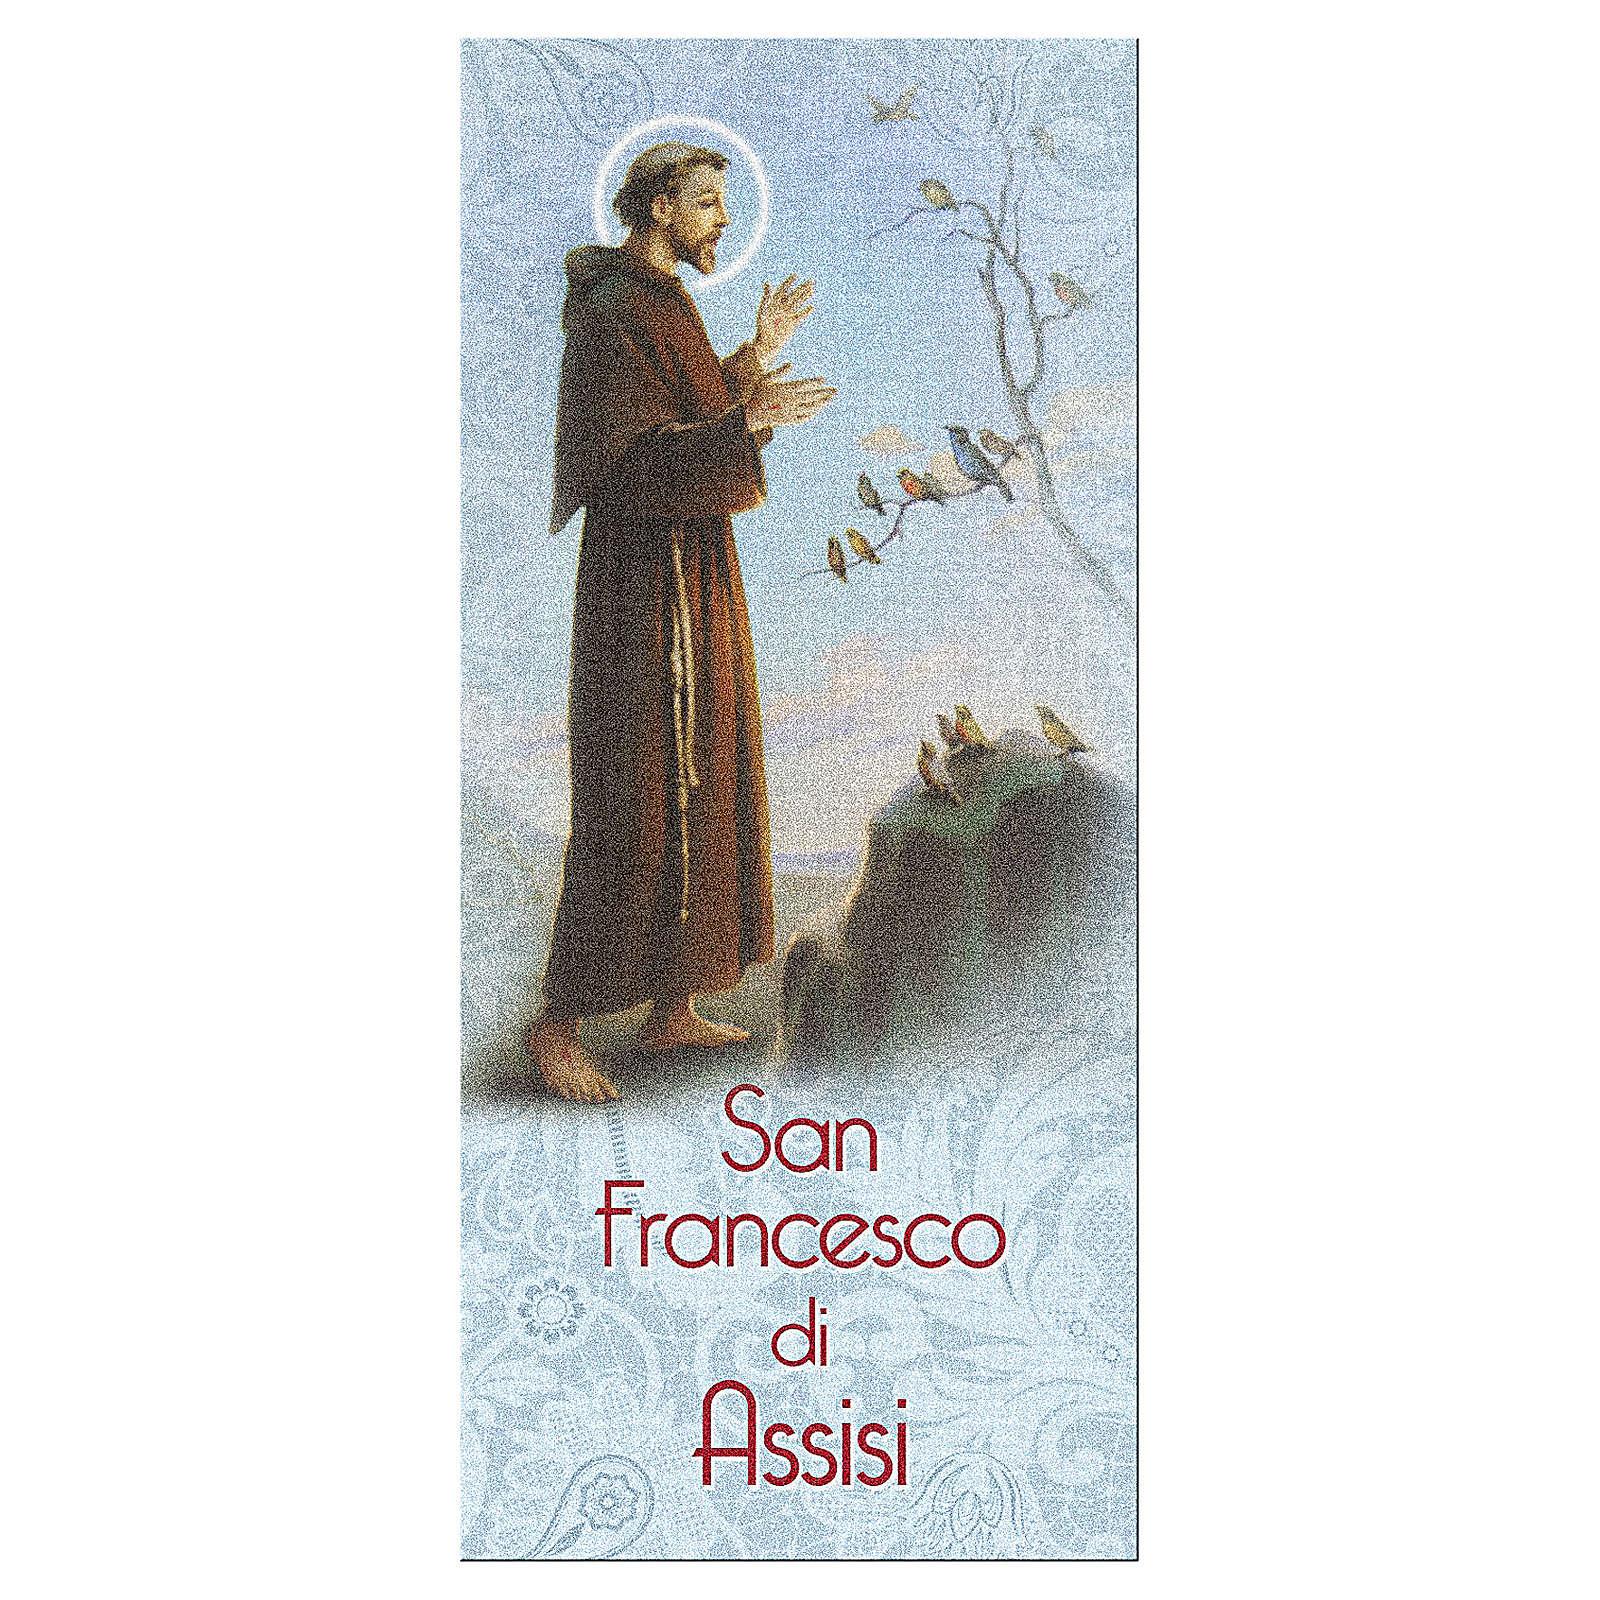 Segnalibro carta perlata San Francesco d'Assisi Preghiera 15x5 cm ITA 4